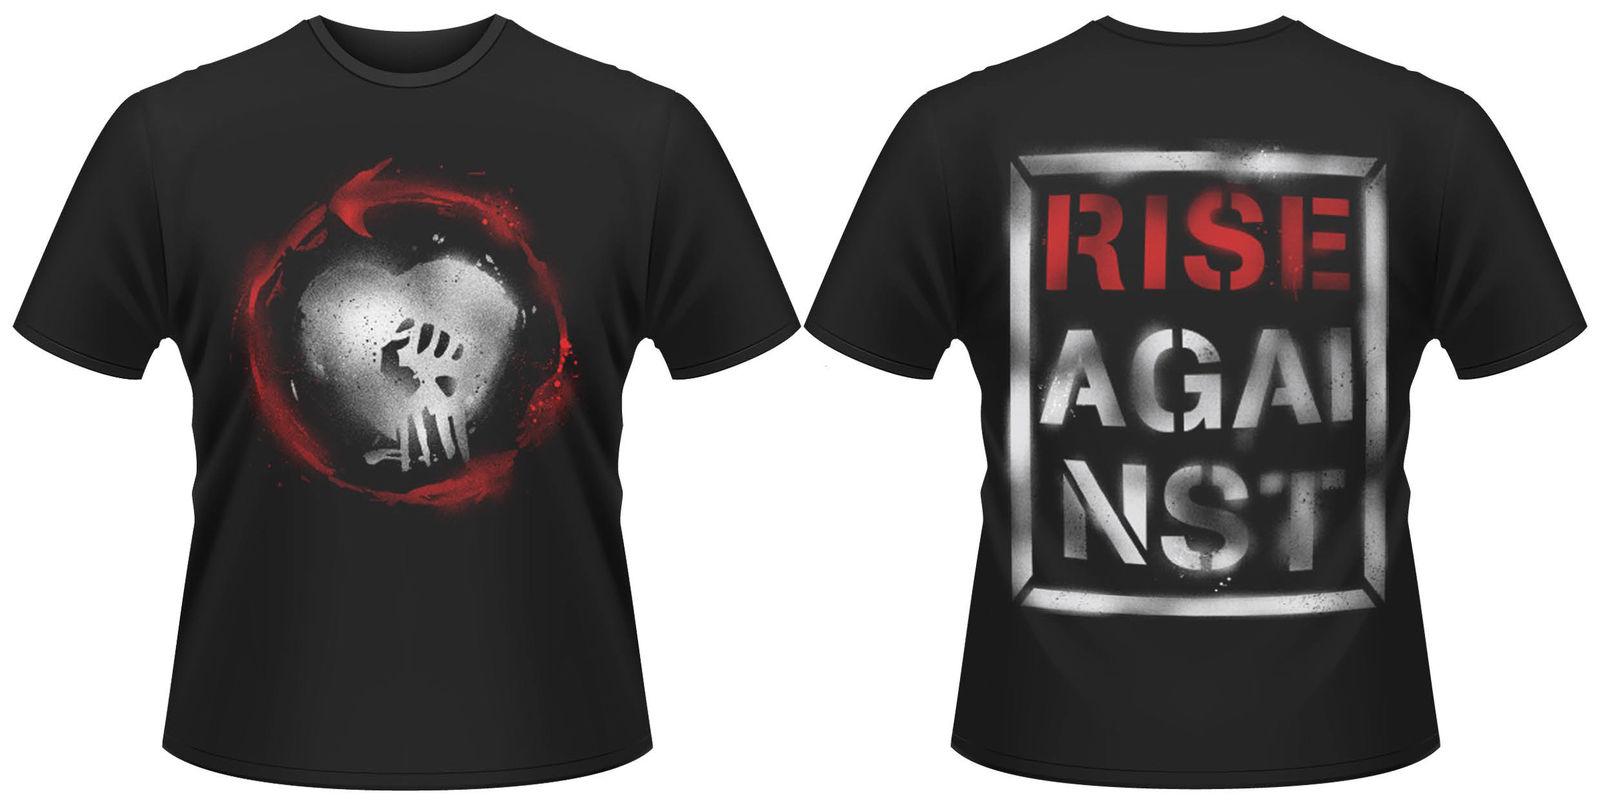 Rise Against CAUTION T-SHIRT - NUOVO E ORIGINALE